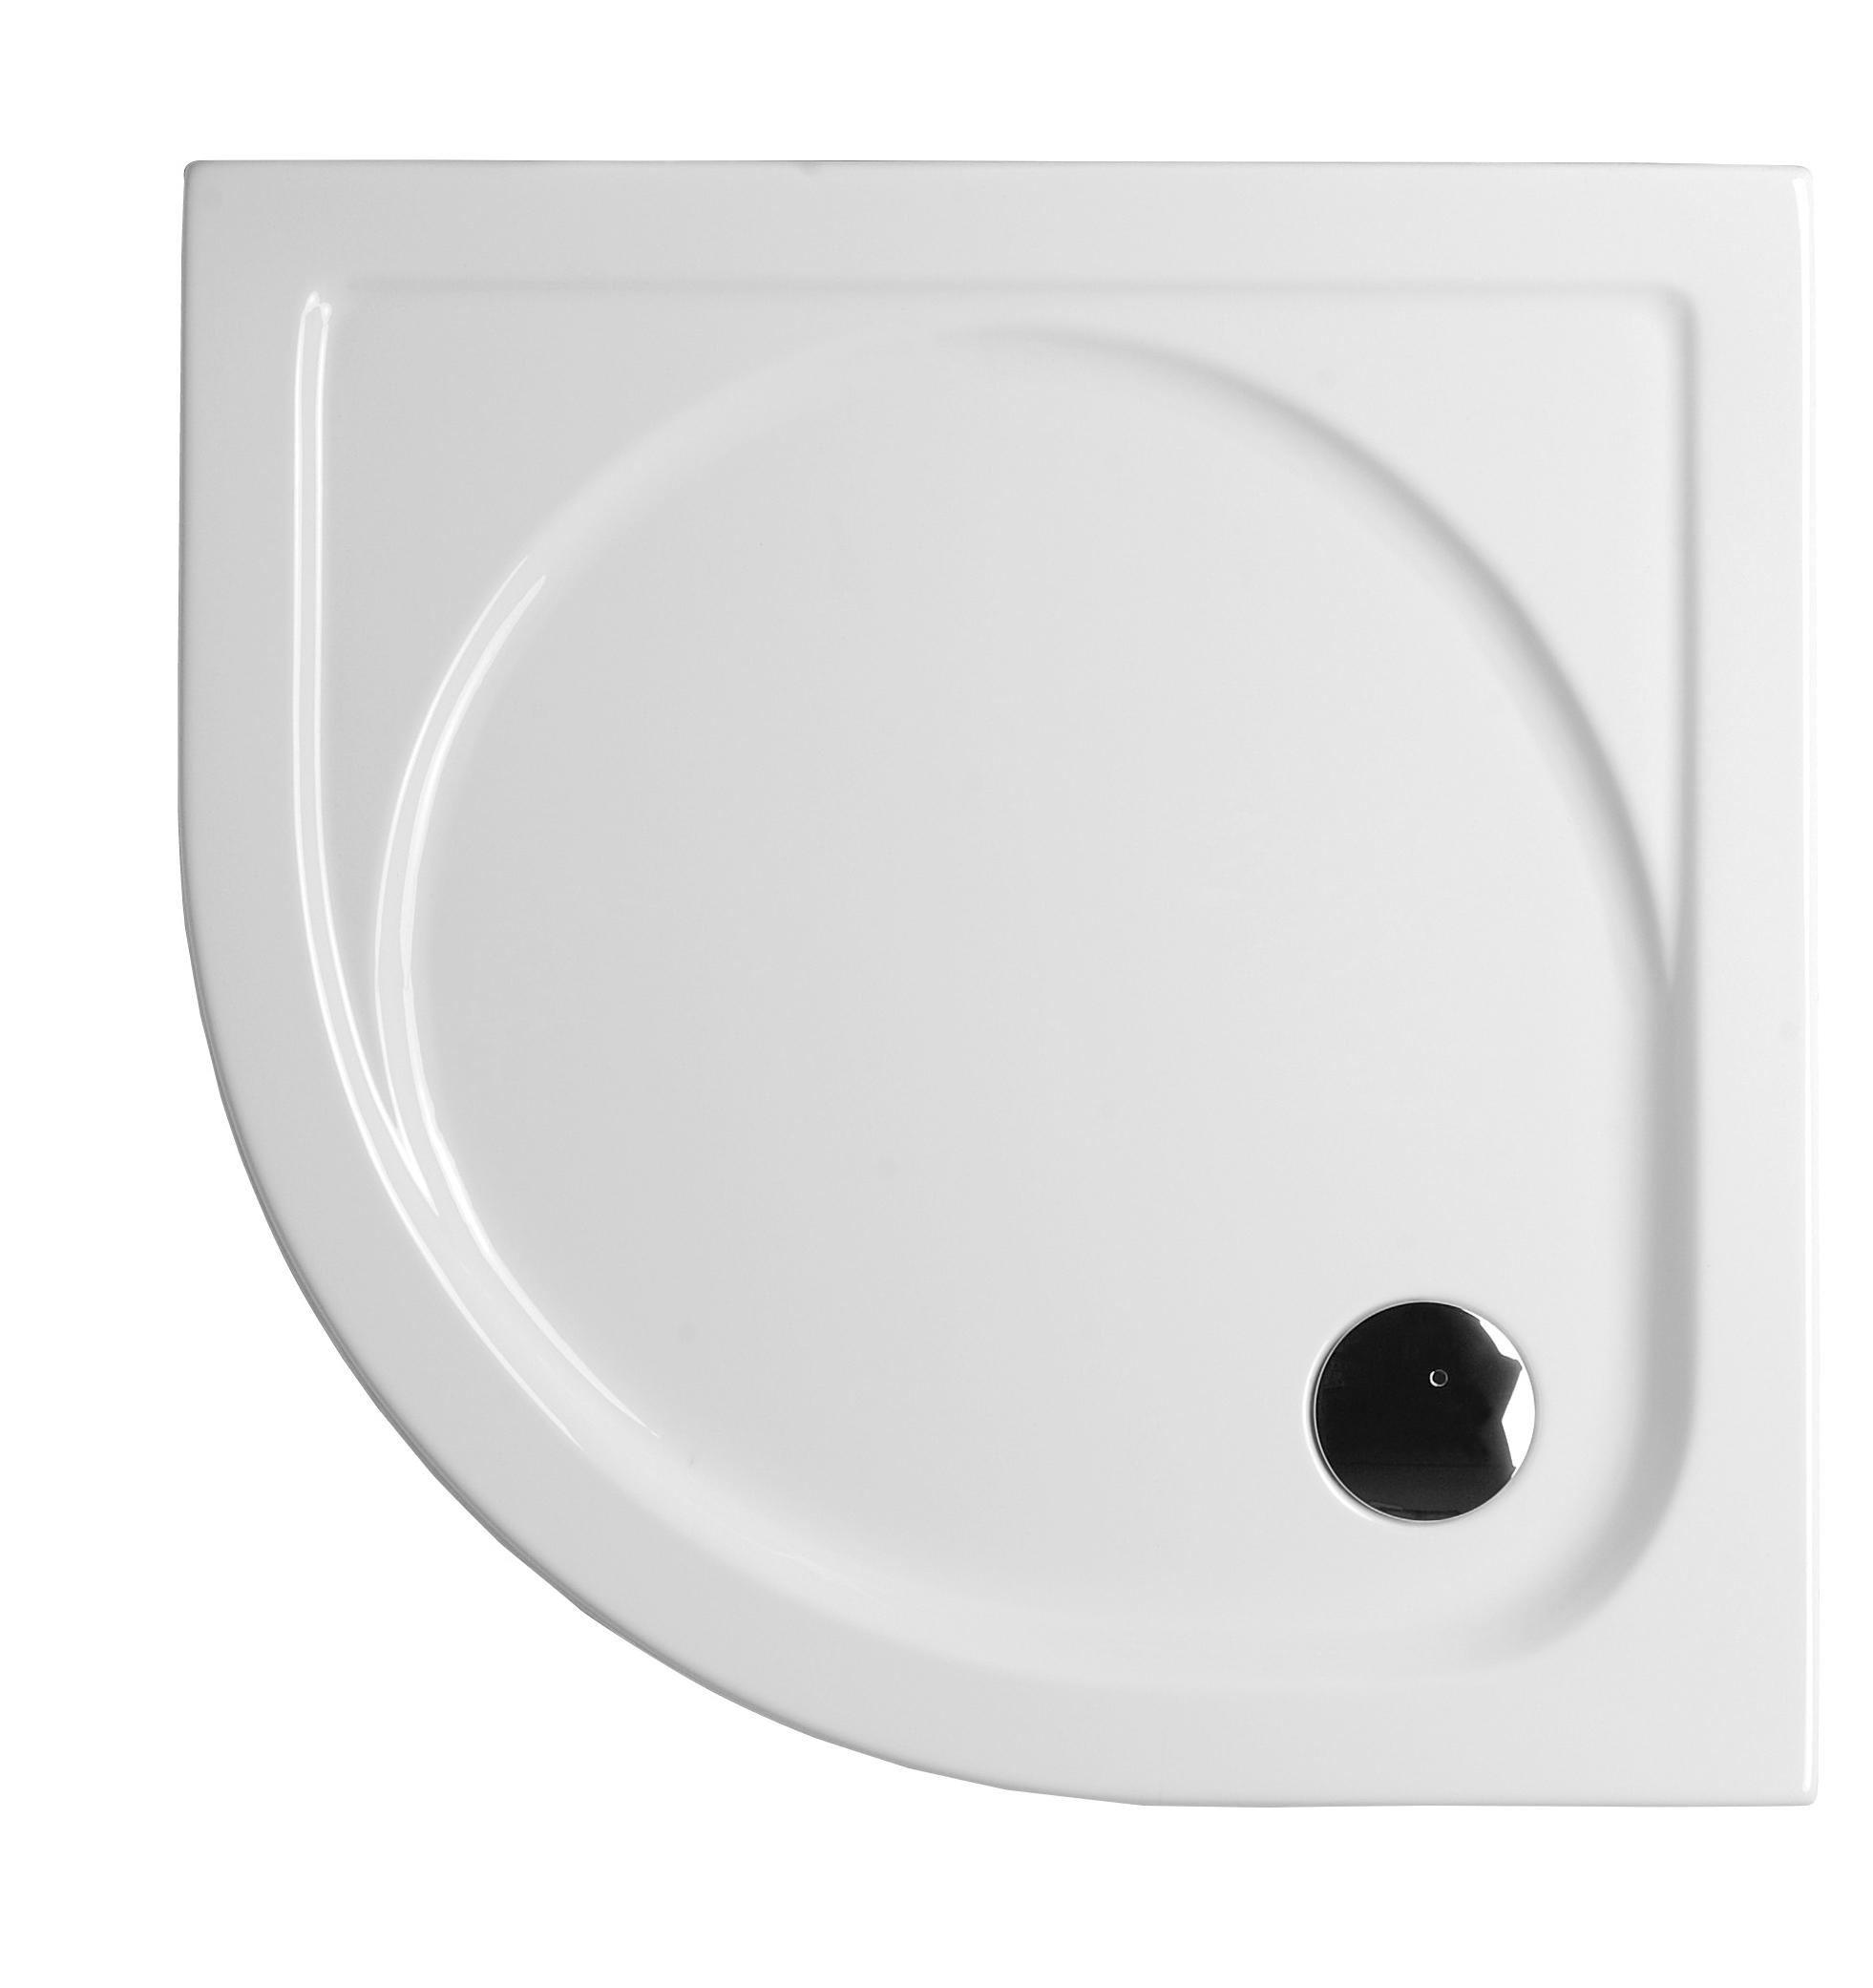 Integra receveur ultra plat en acrylique, 1/4 rond, 100  x  100 cm, VitrA Antislip